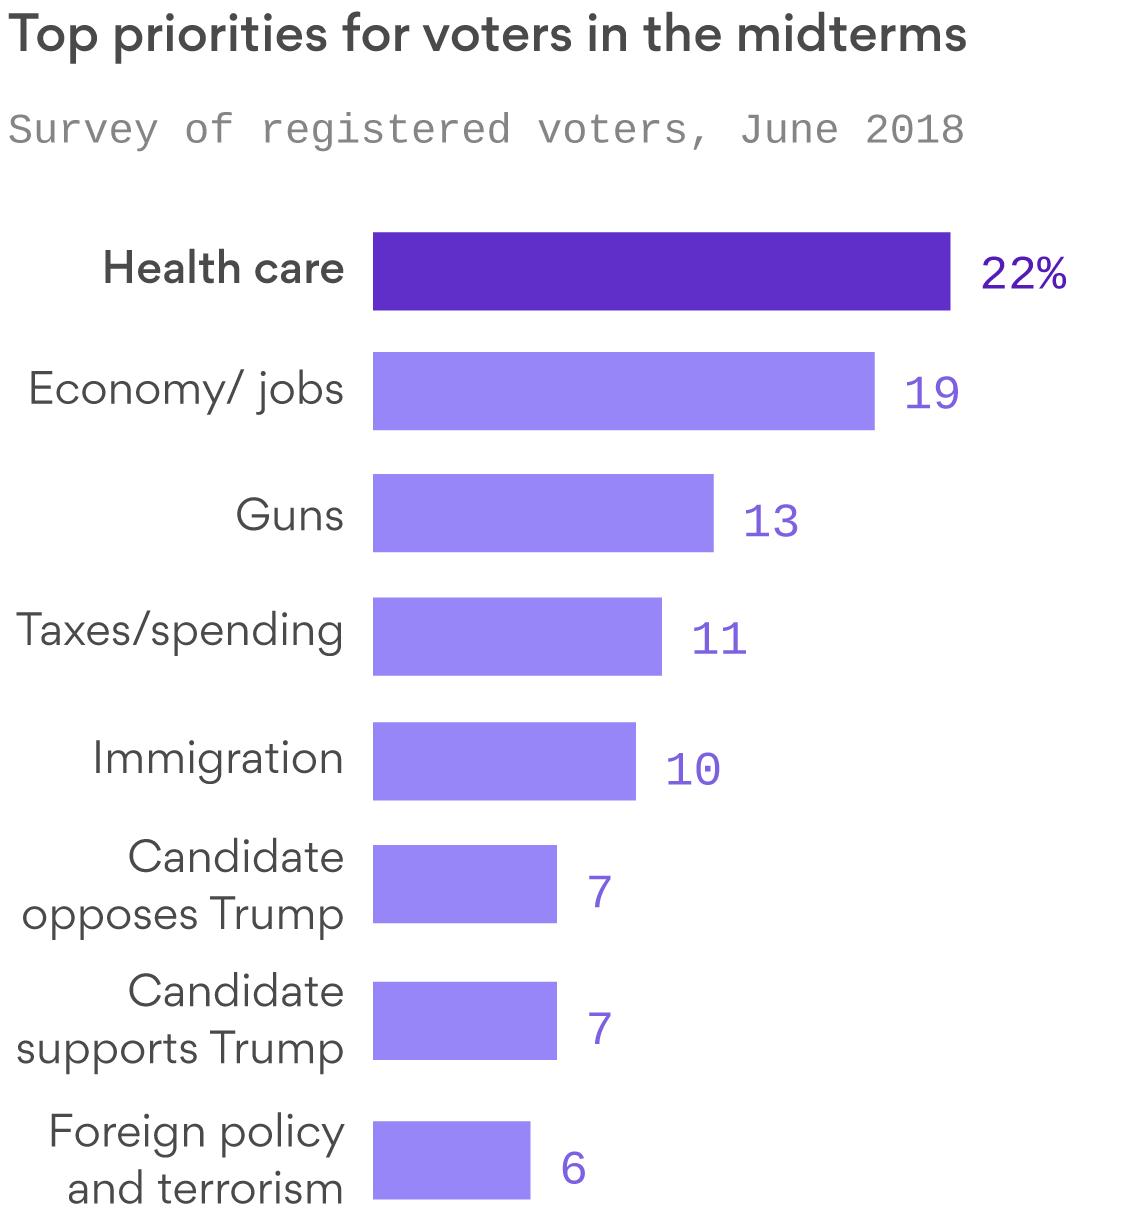 Between the lines: Health care is top voter priority in 2018